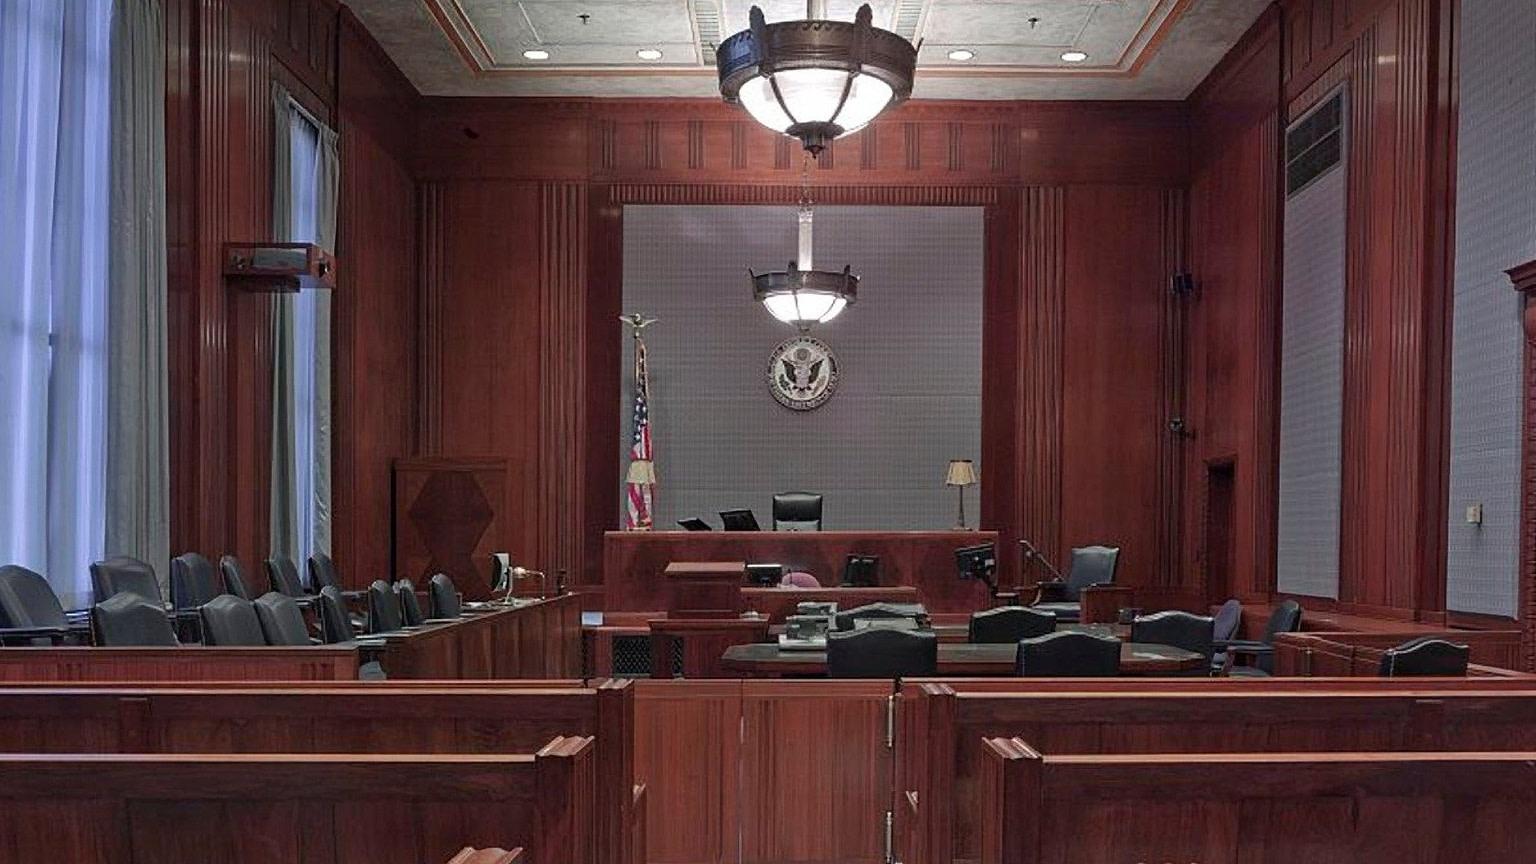 Child Sex-Trafficking Survivor Chrystul Kizer Granted Chance To Pursue Affirmative Defense Law In Her Case